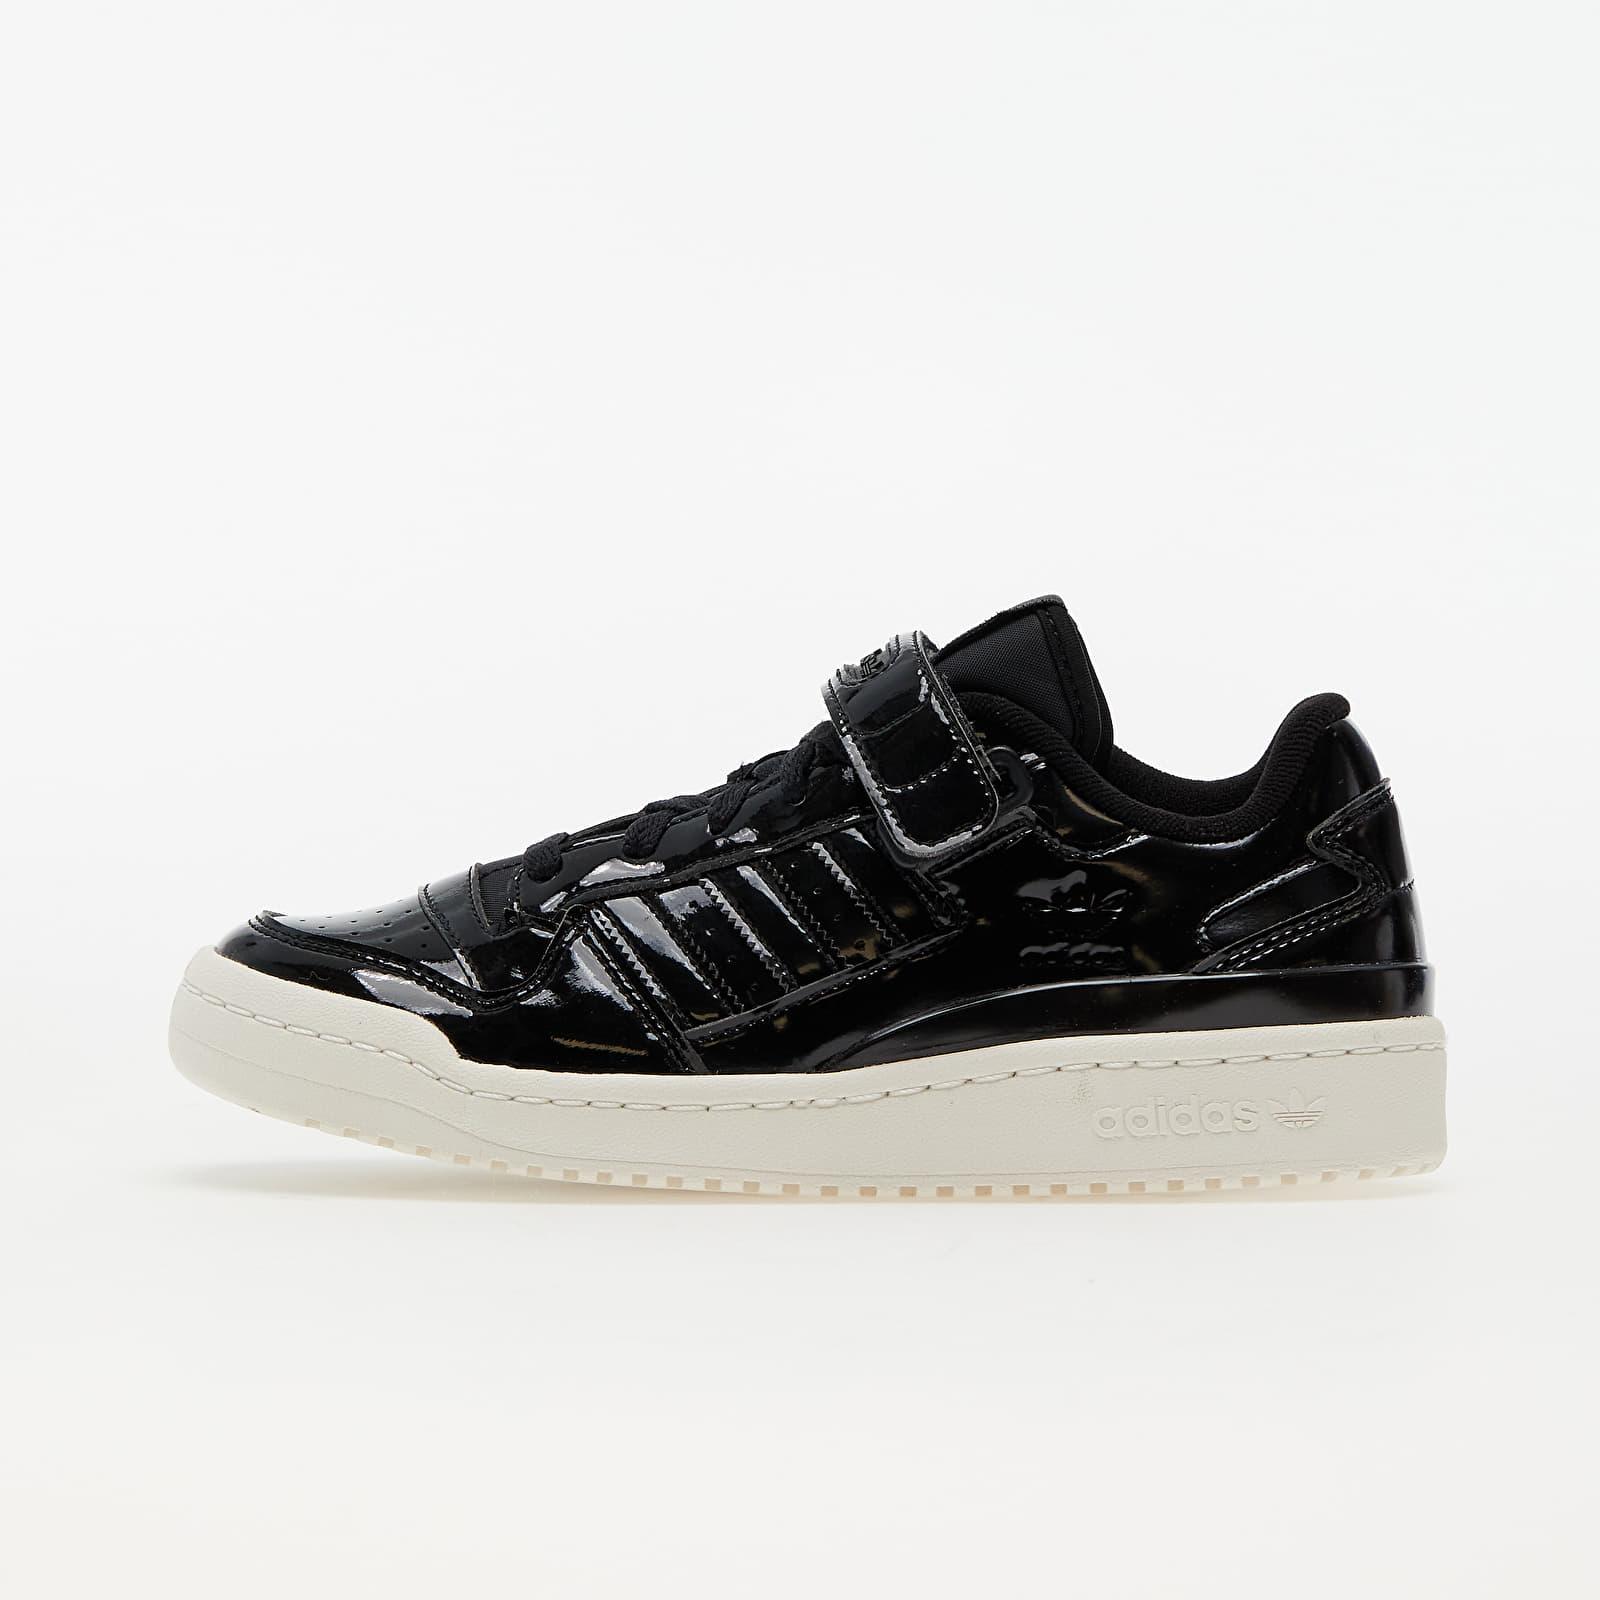 adidas Forum Low W Core Black/ Core Black/ Off White EUR 40